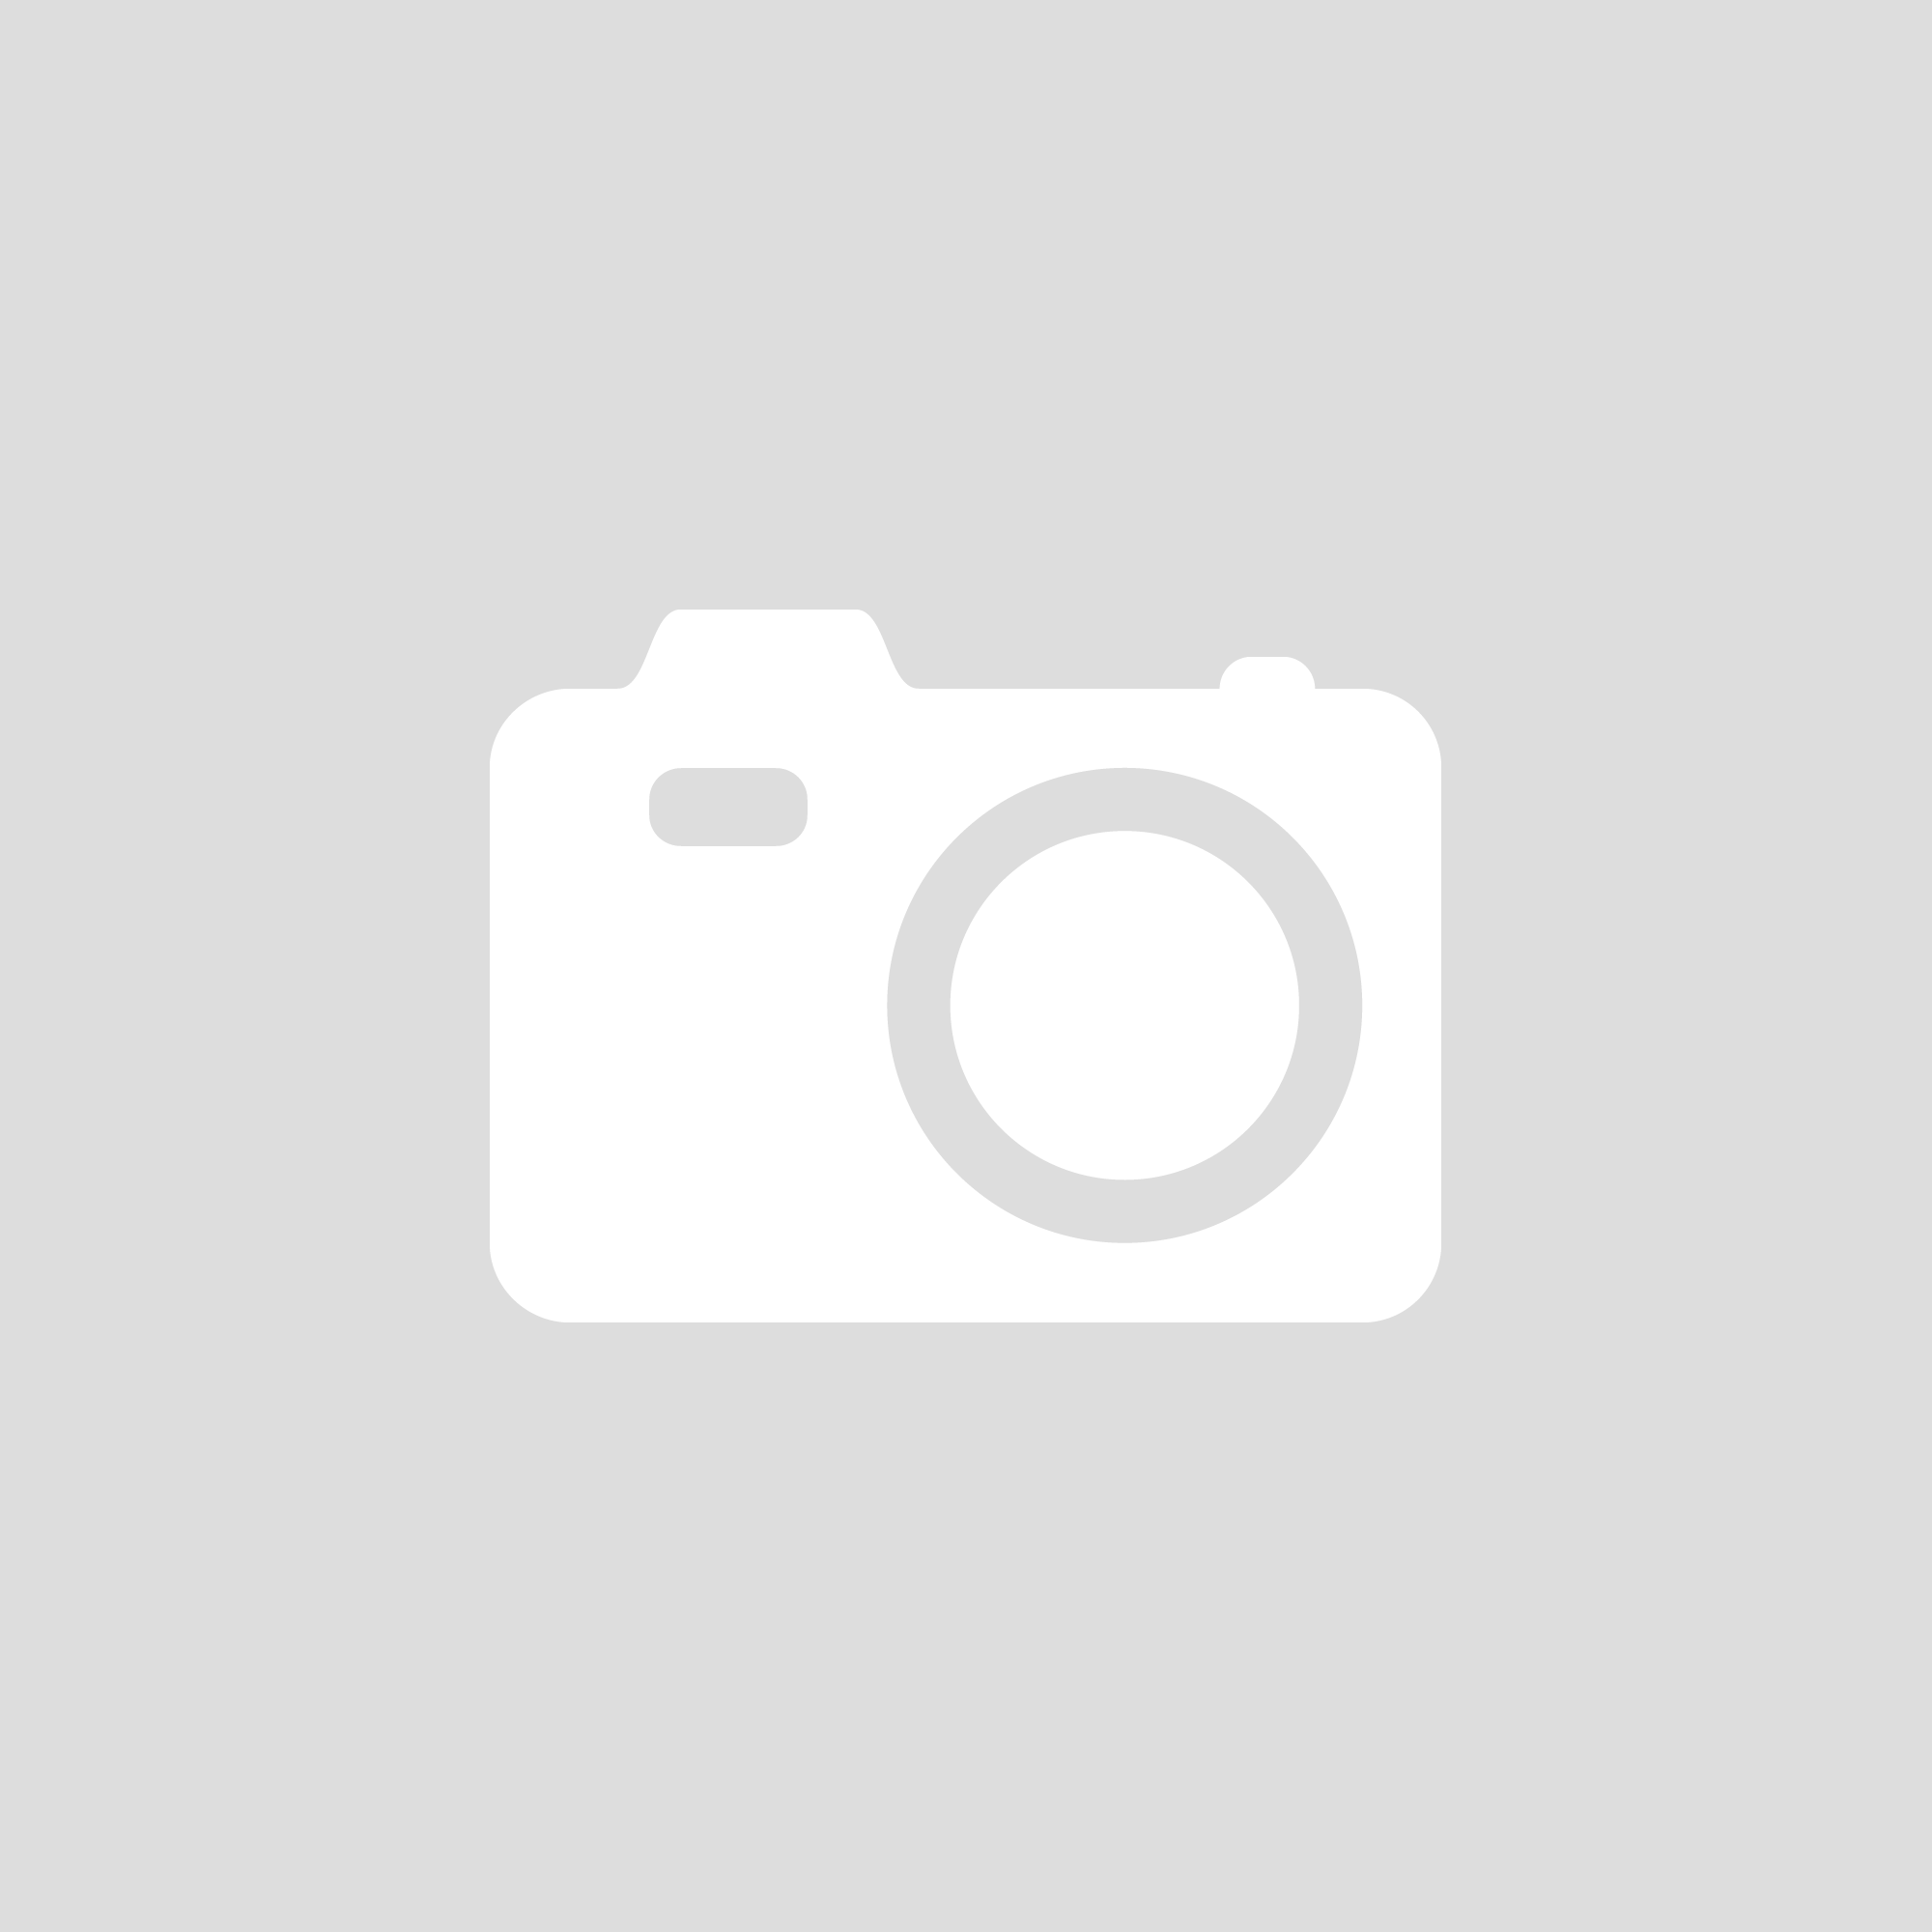 Laurel Plain Herringbone Wallpaper by Moda Black Label 335